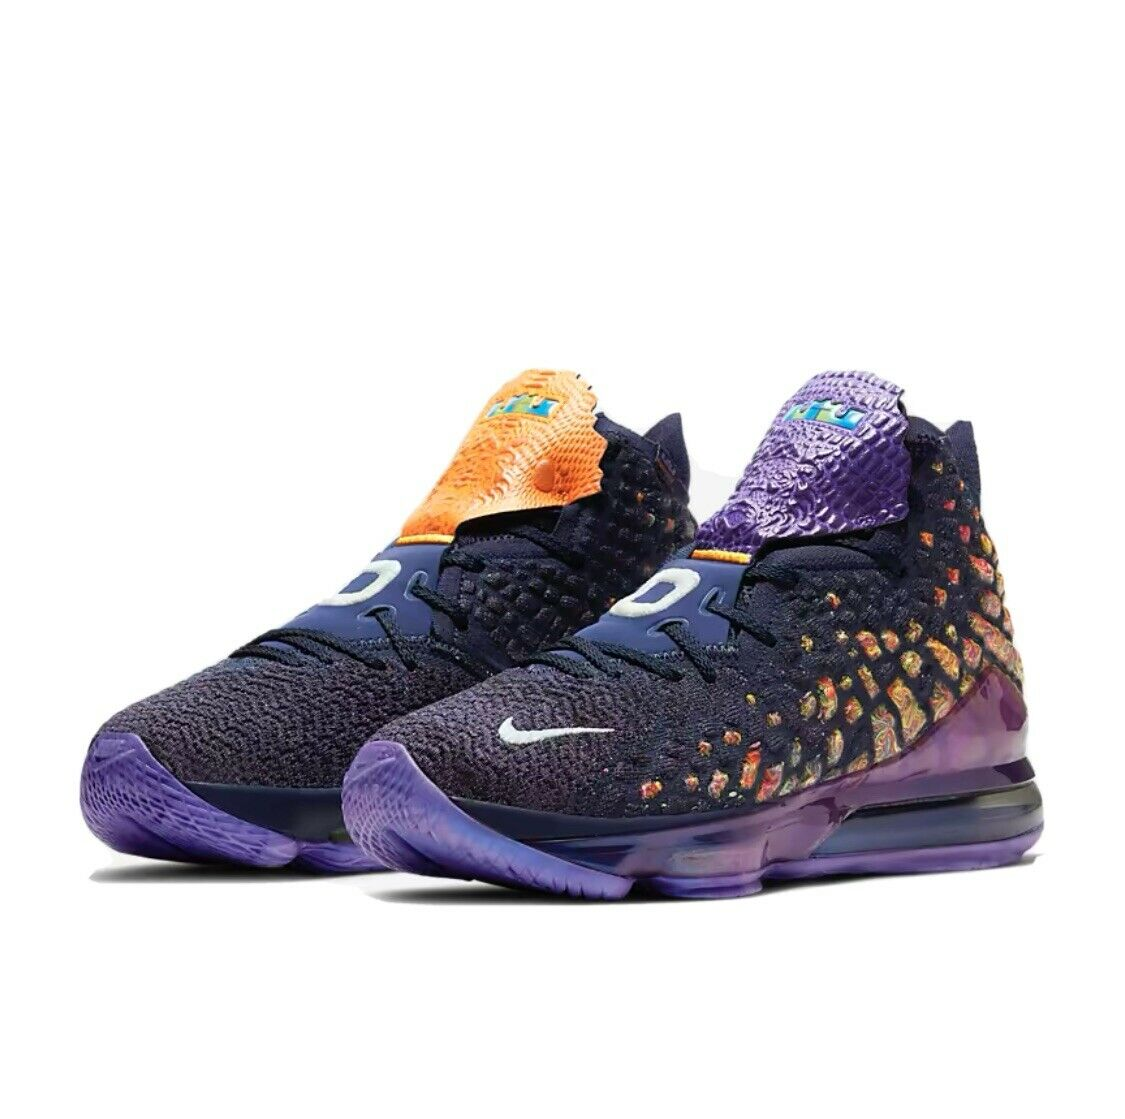 Nike Lebron 17 Monstars ASG Space Jam